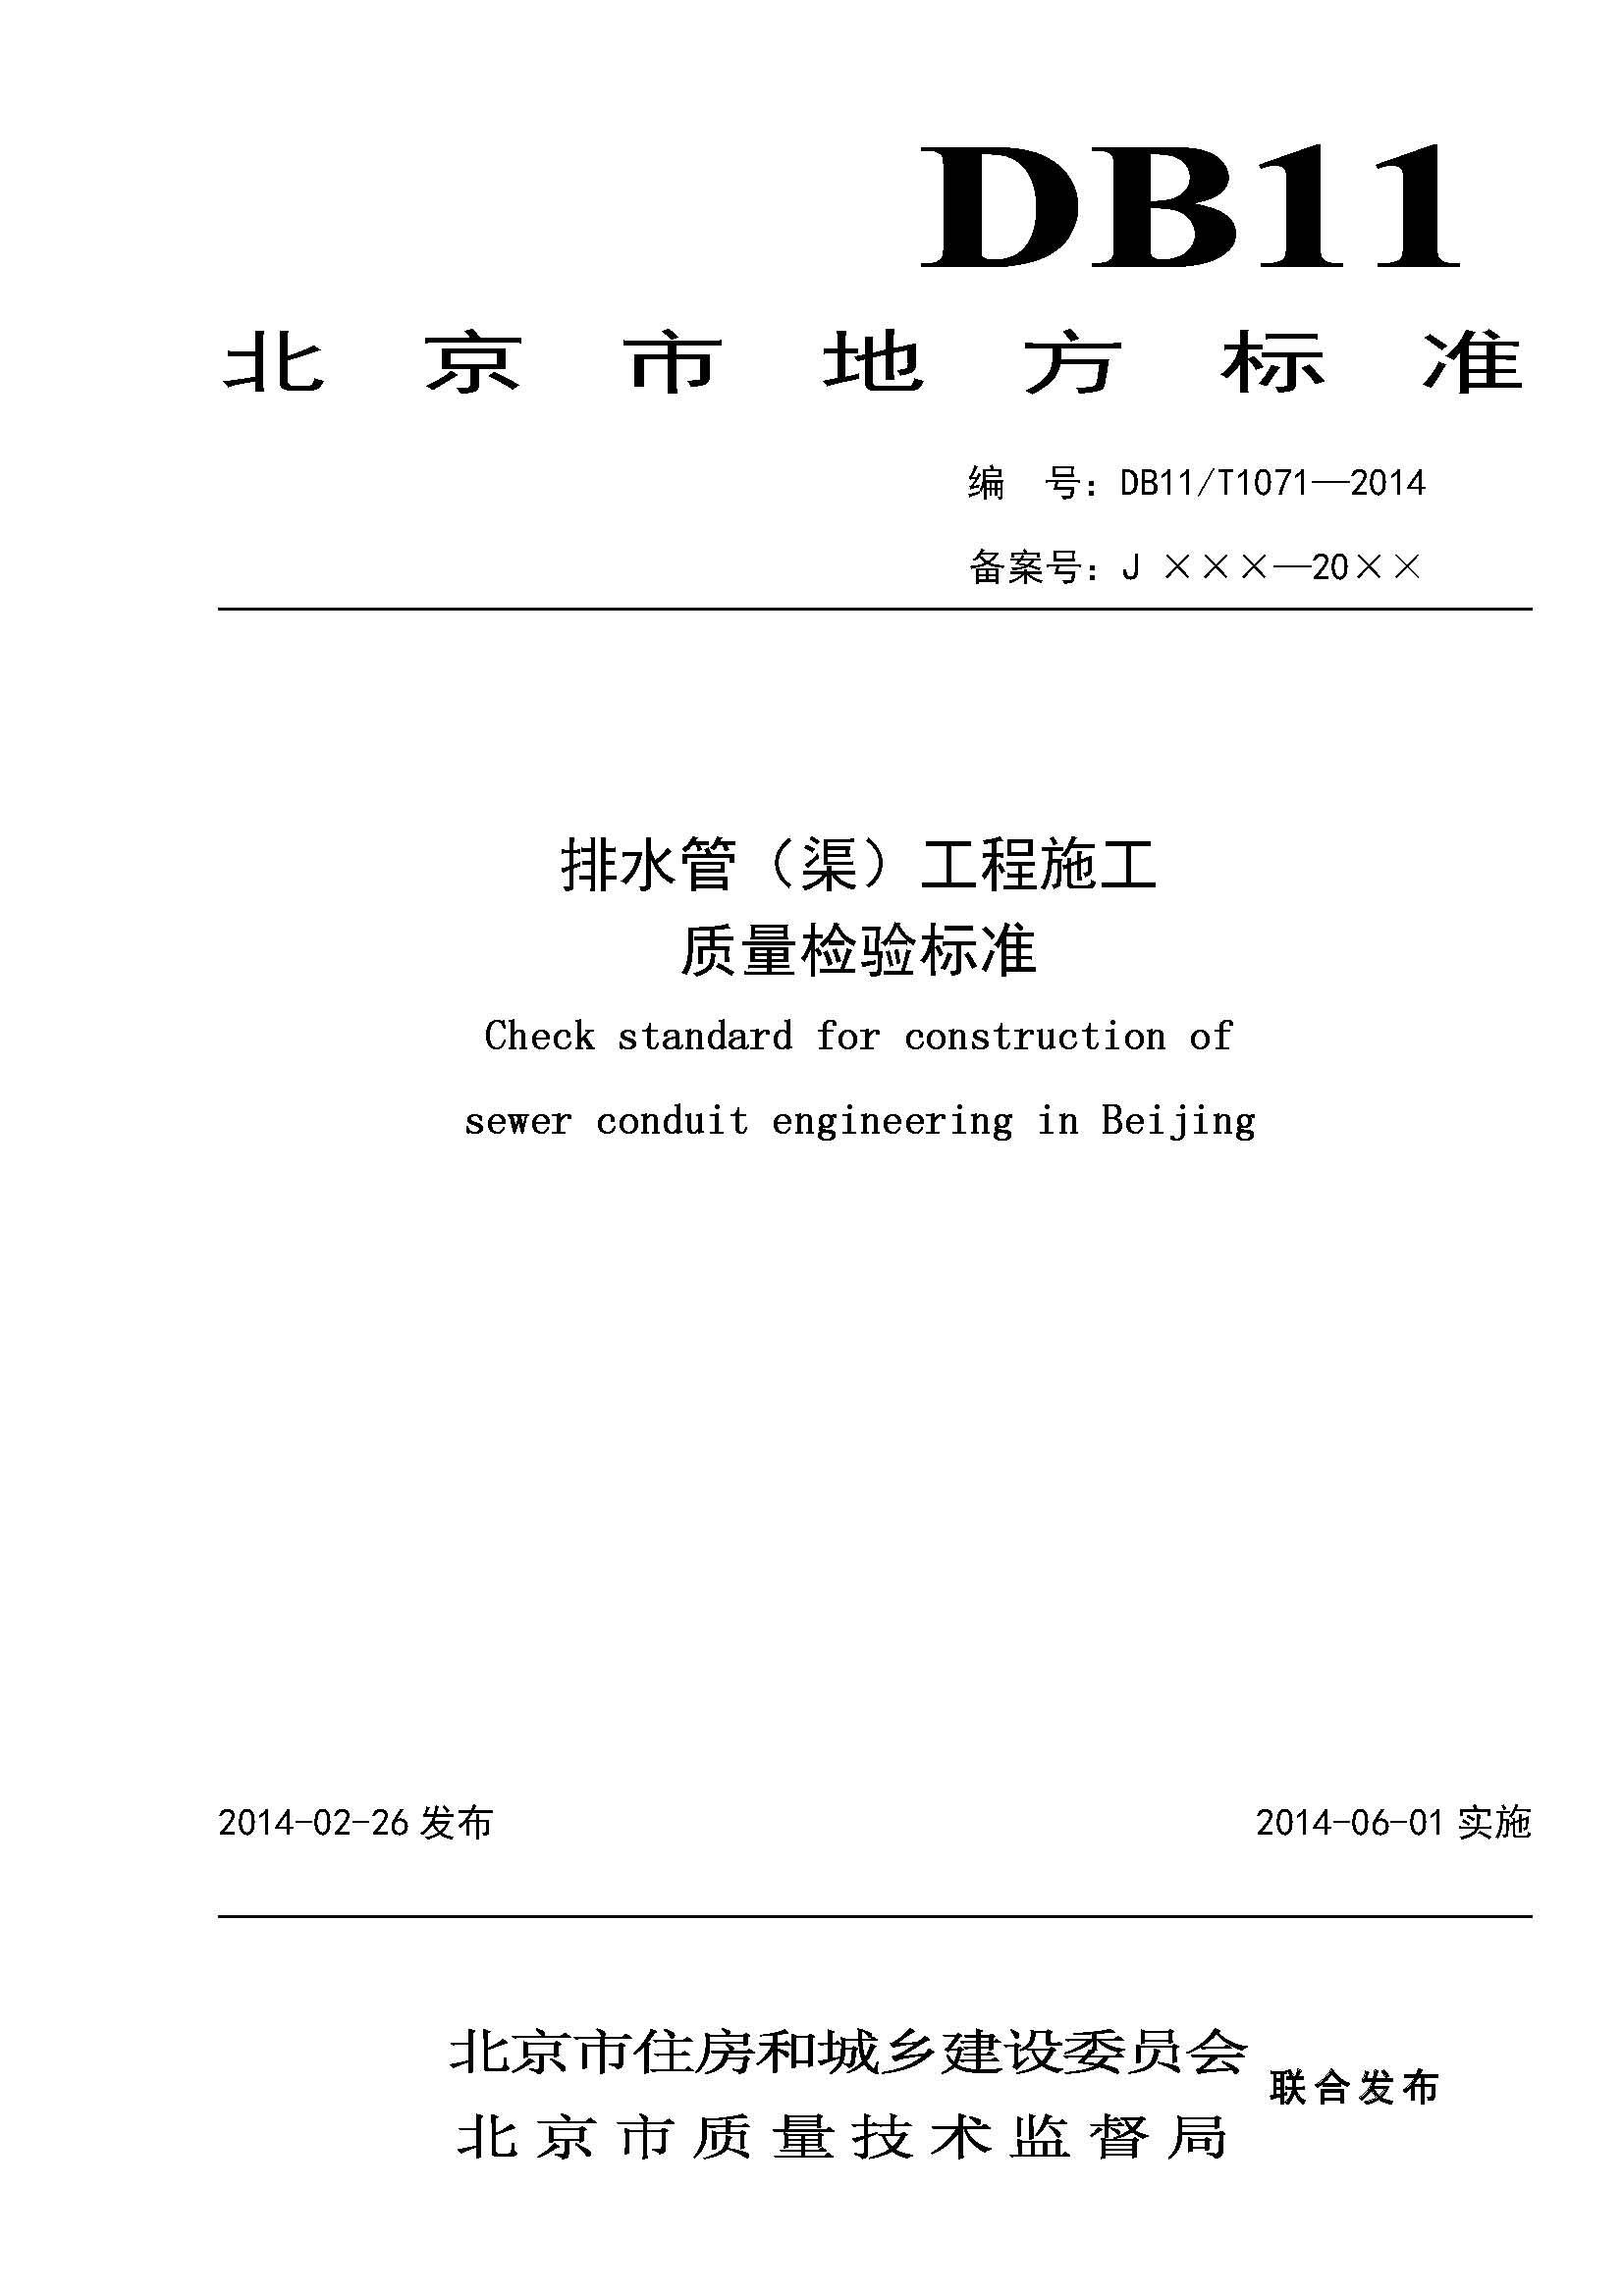 DB11/1071-2014排水管(渠)工程施工质量检验标准